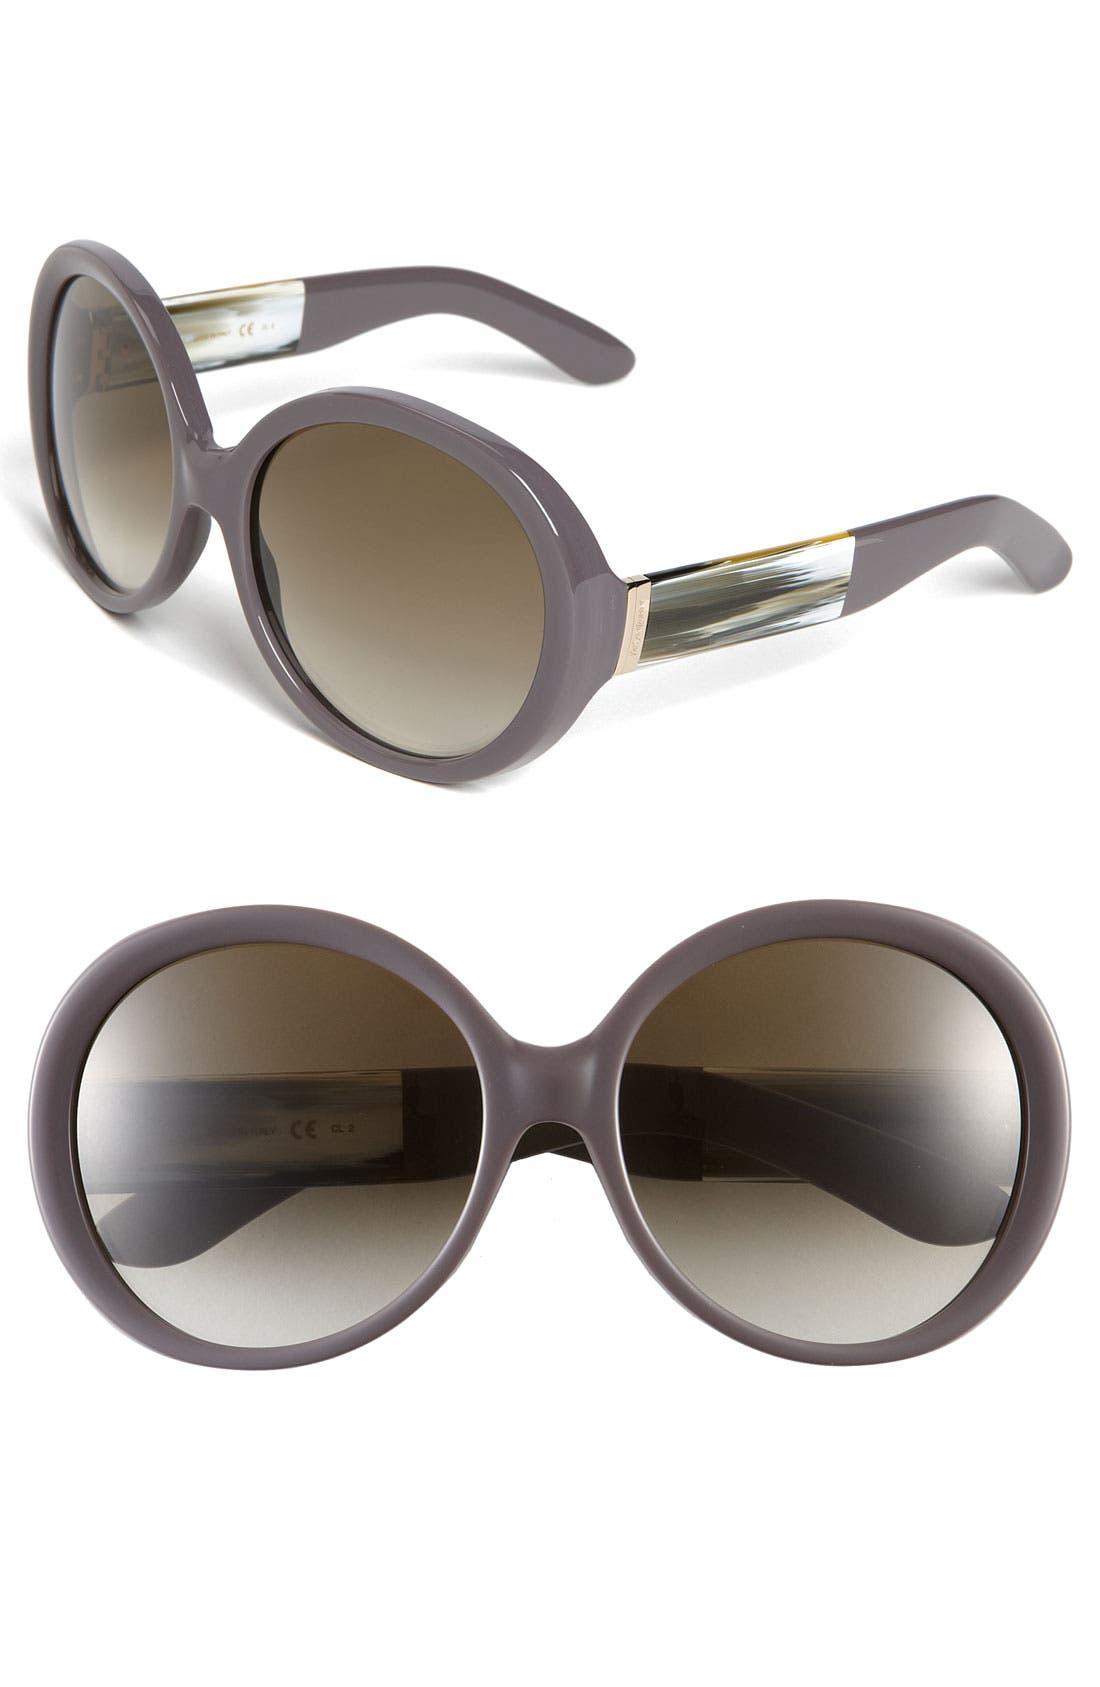 Main Image - Yves Saint Laurent Oversized Round Sunglasses